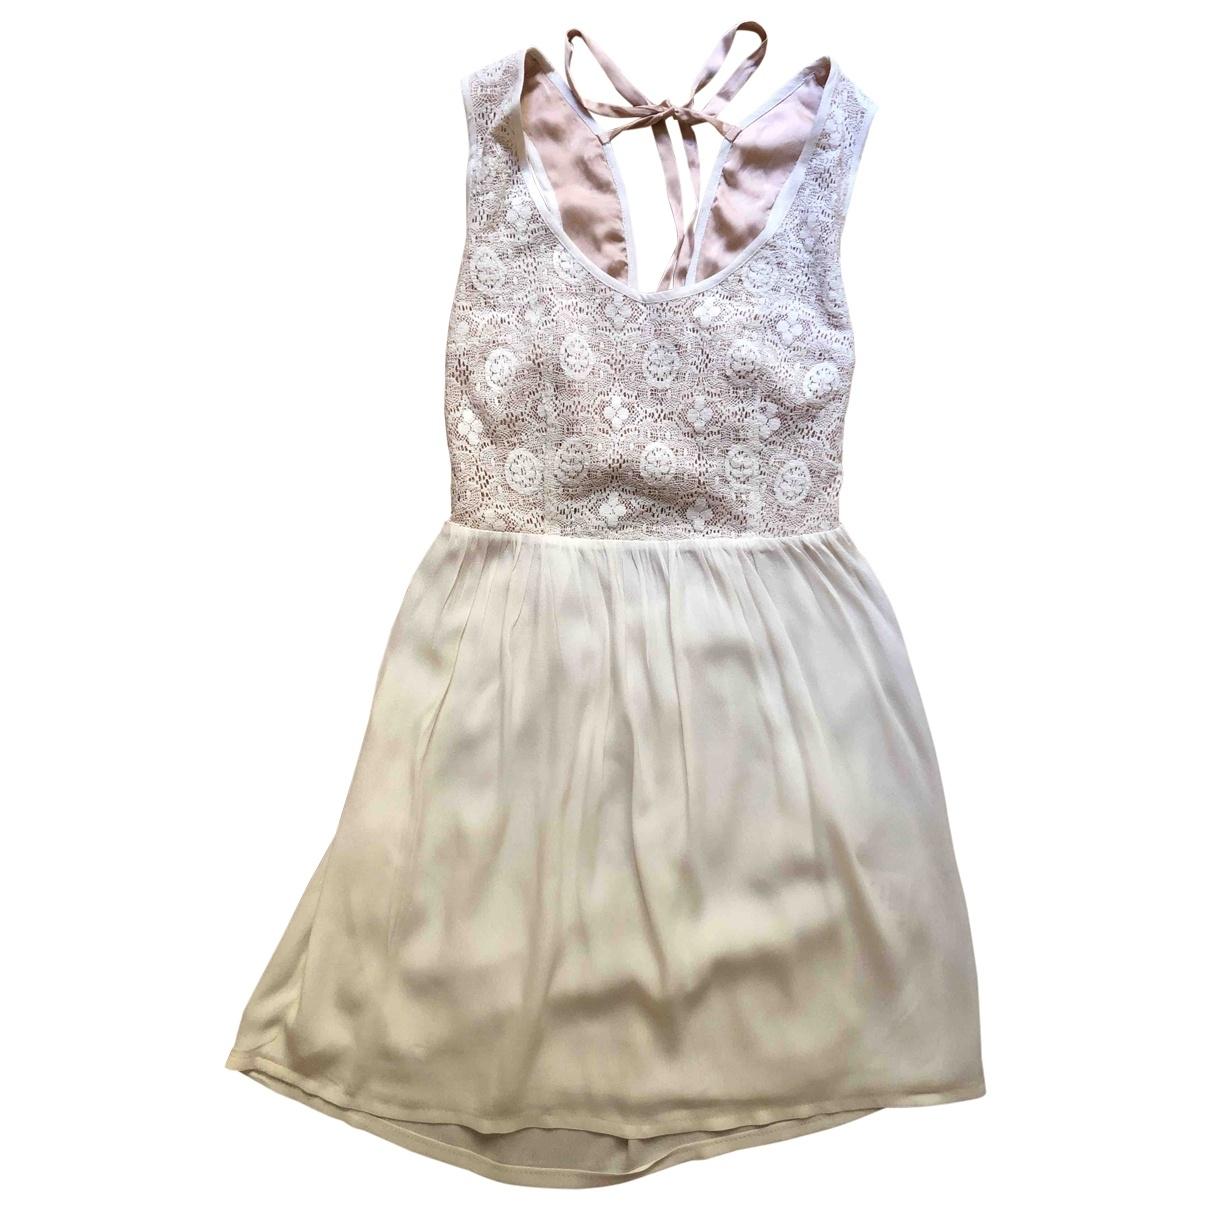 Claudie Pierlot \N Ecru Cotton dress for Women 36 FR